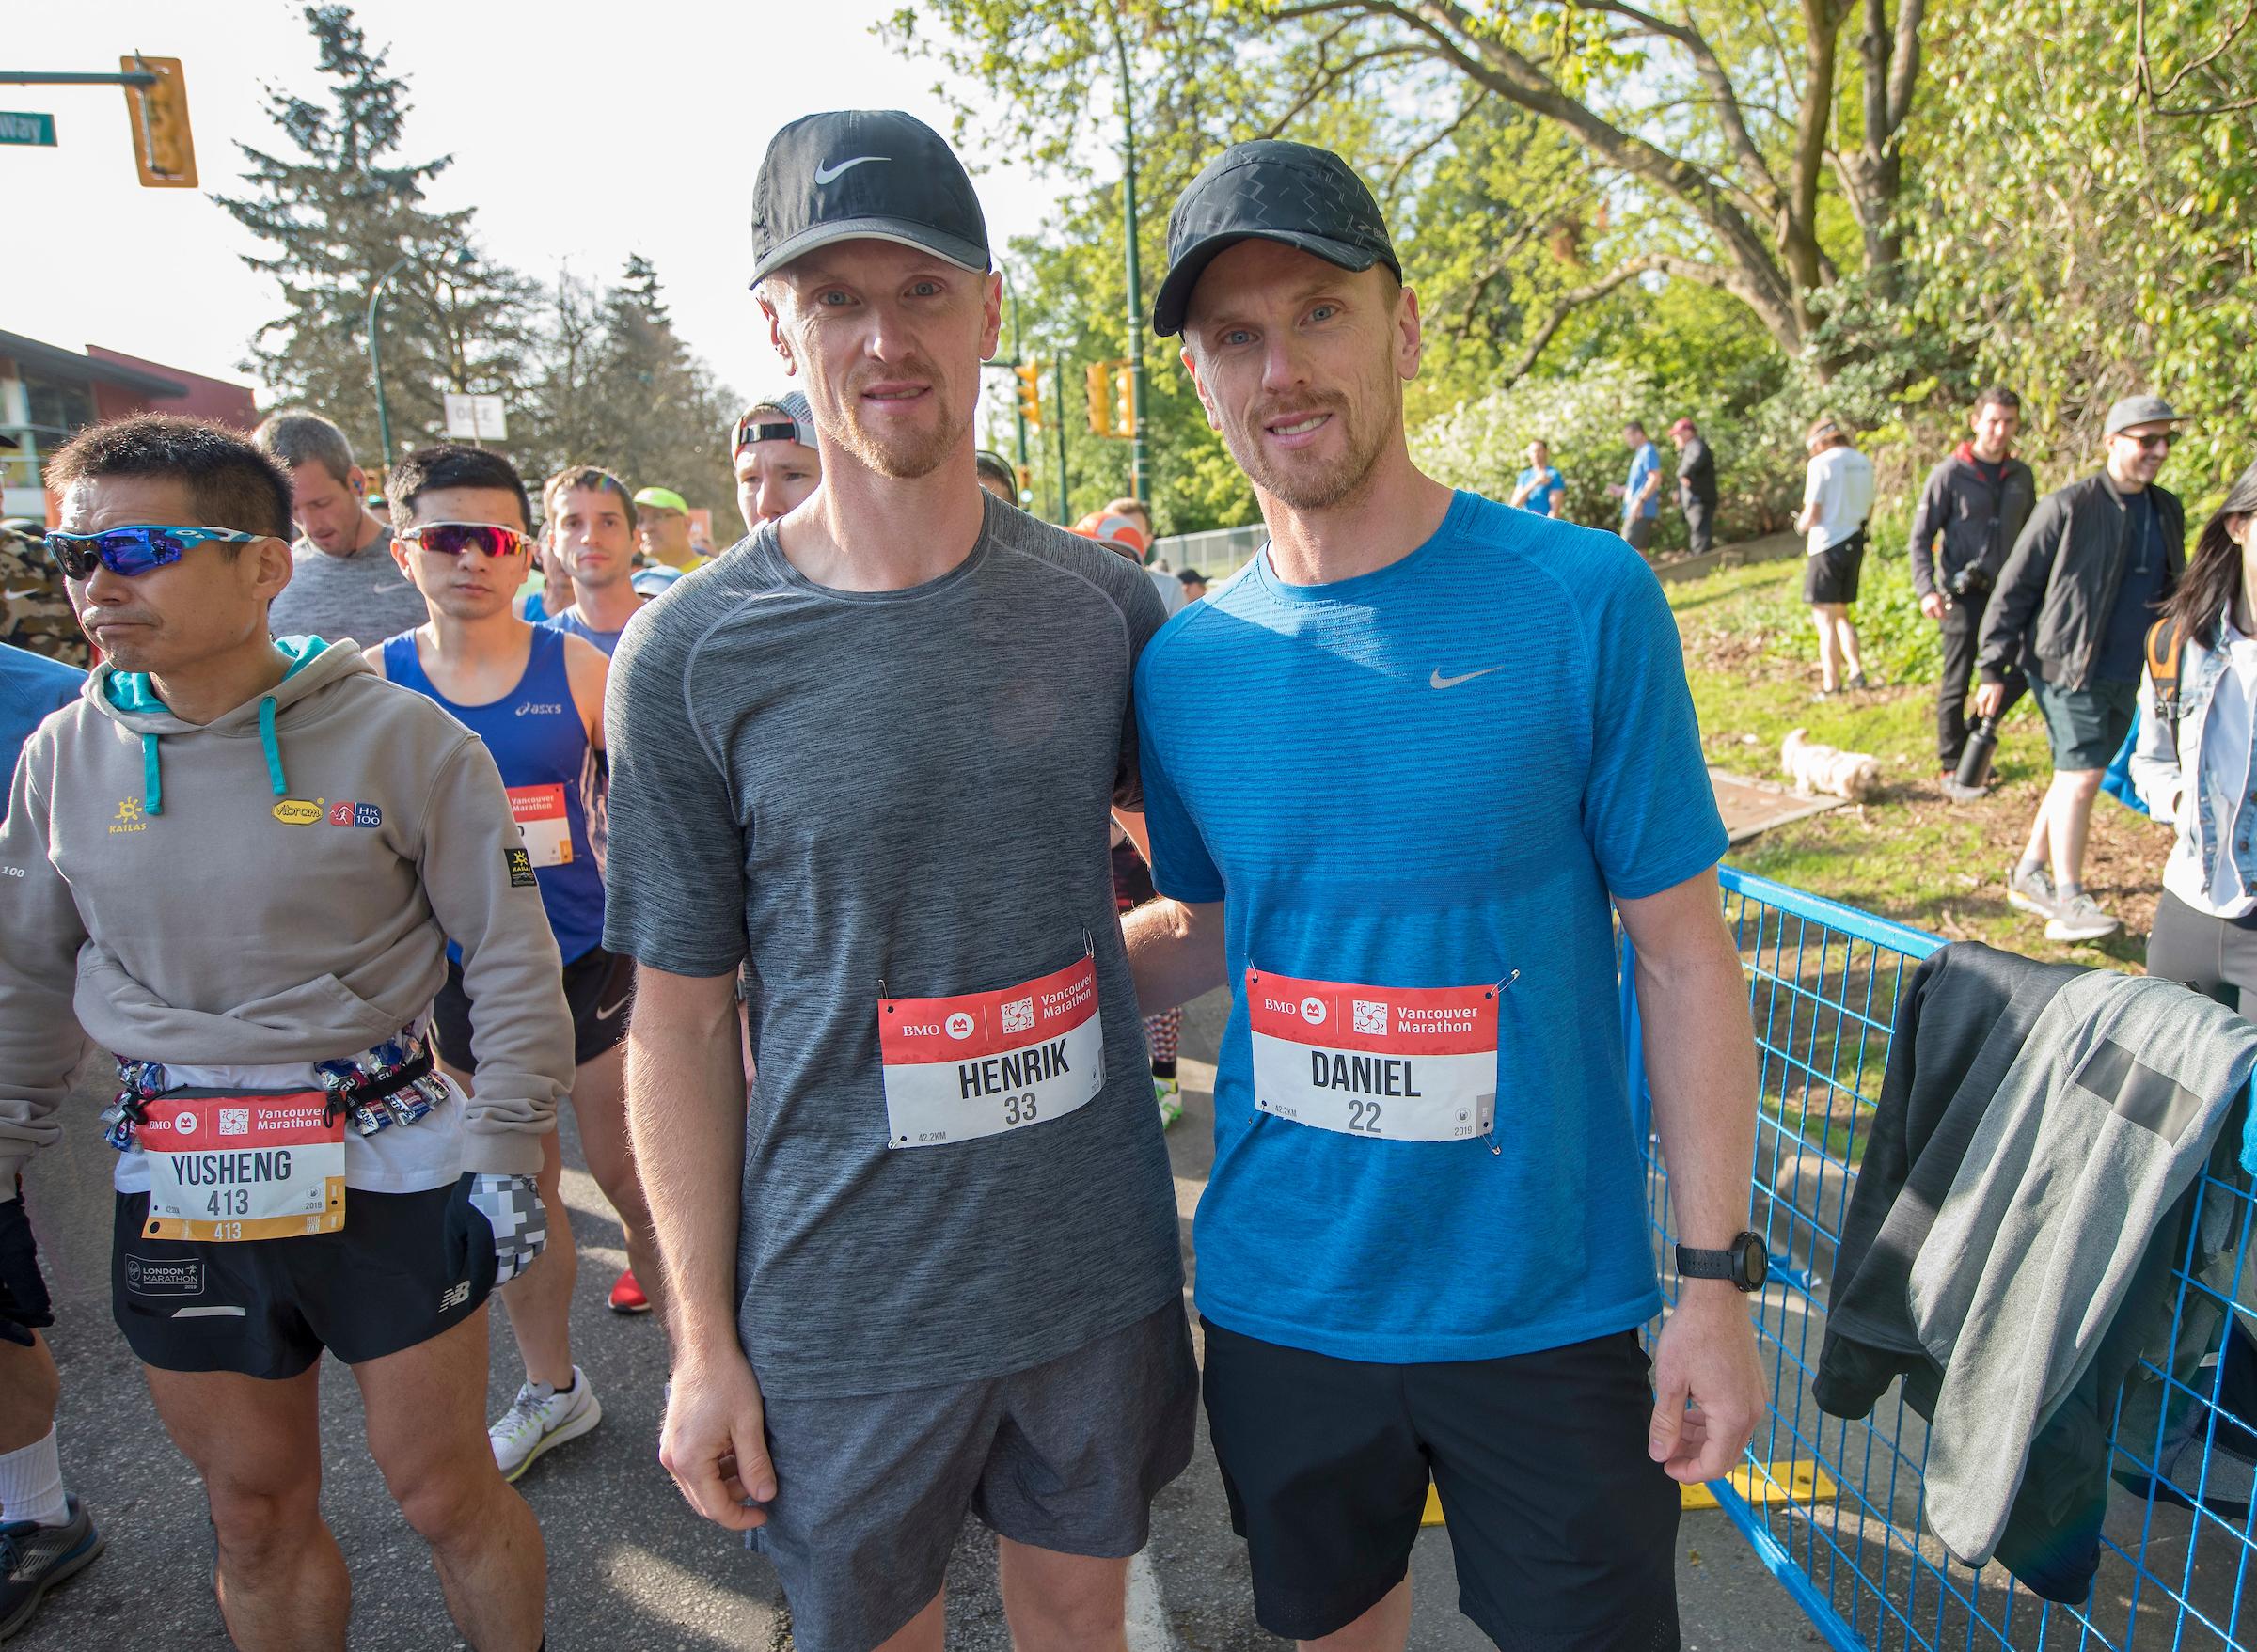 The 2019 Vancouver Marathon